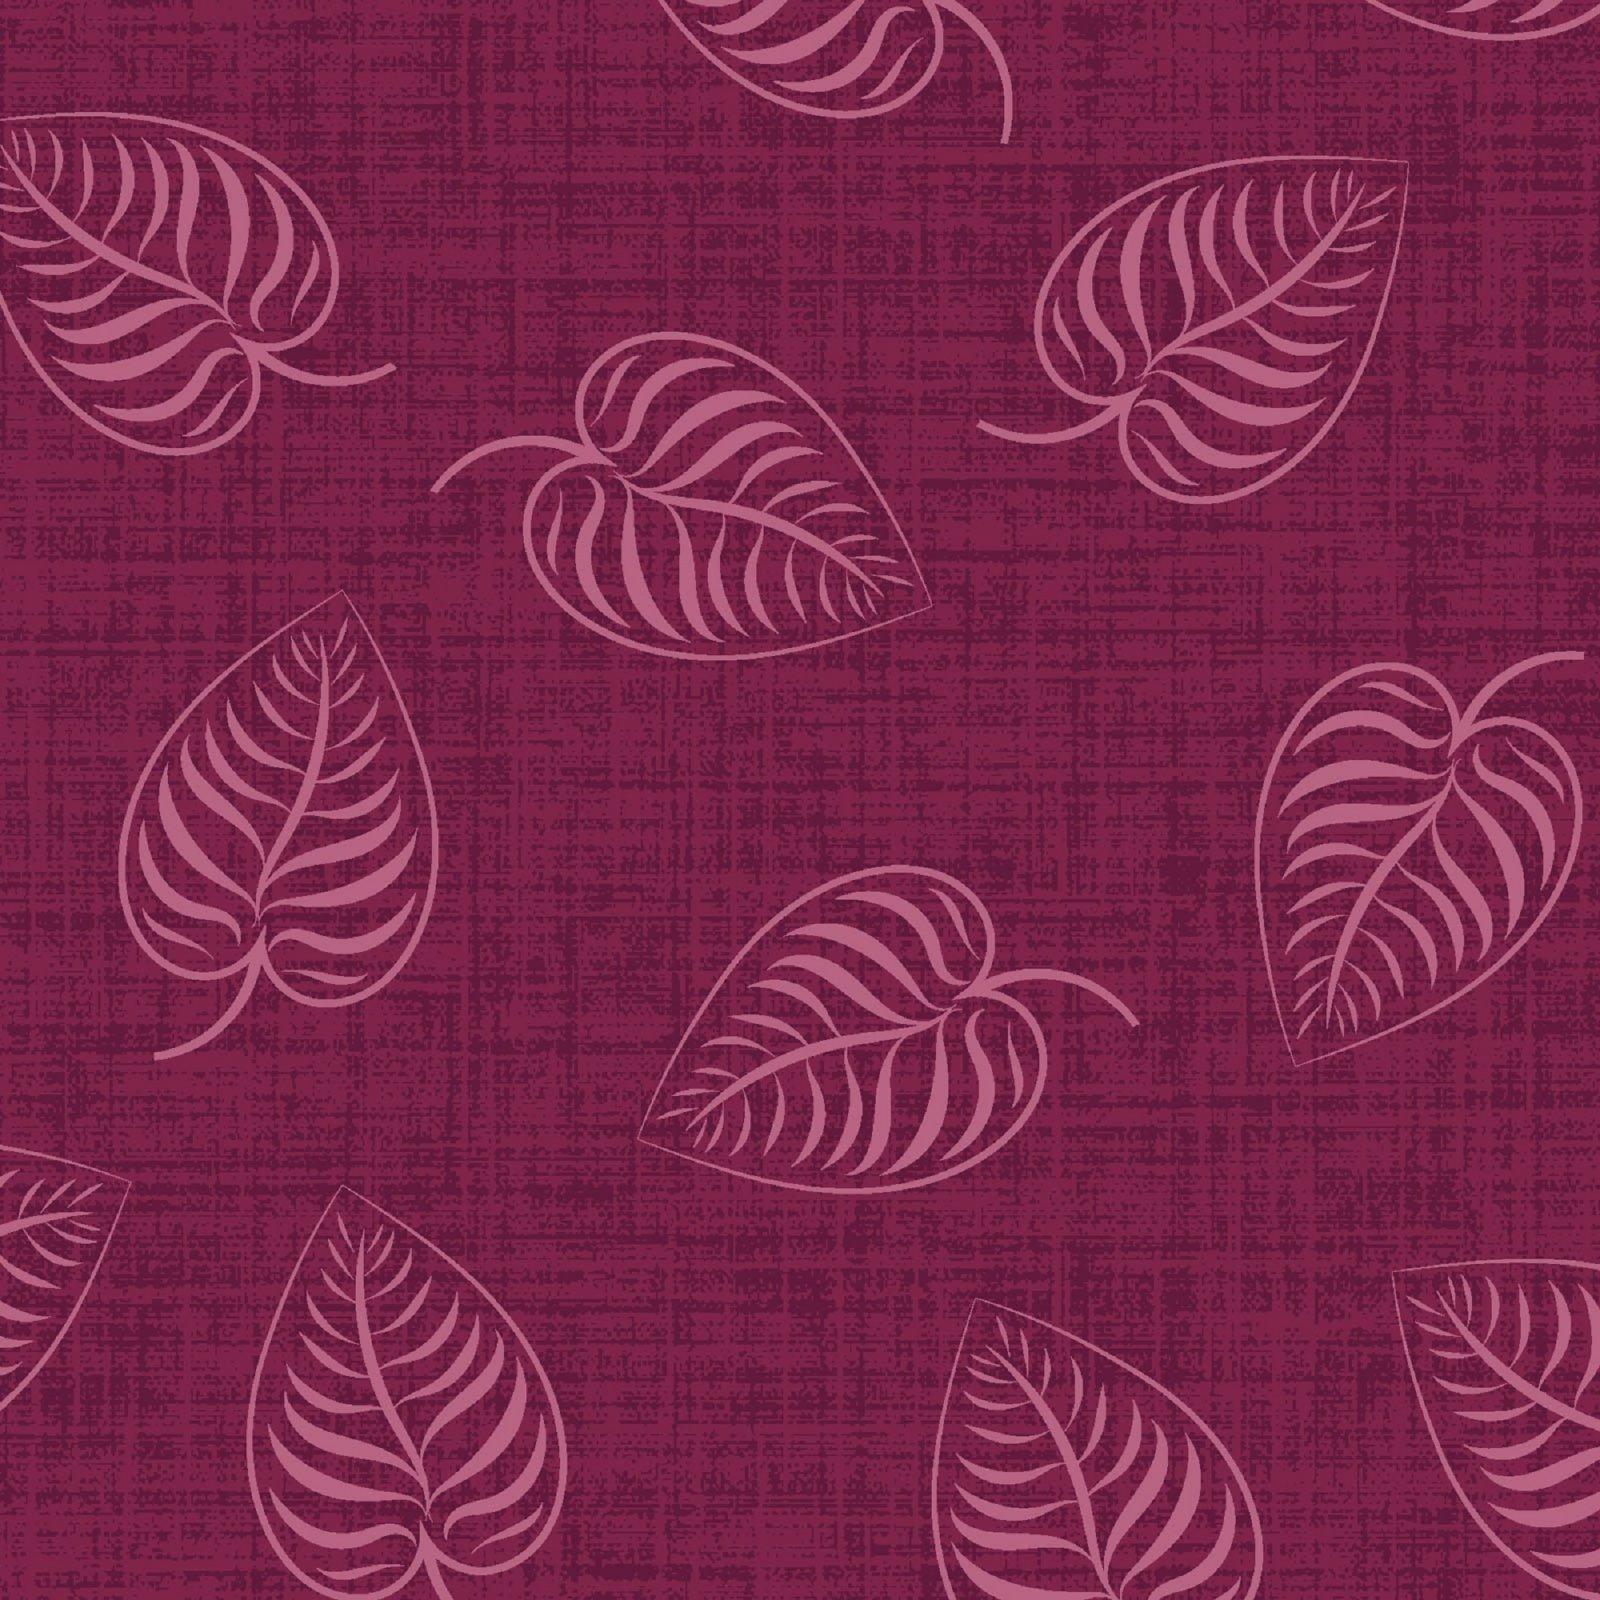 Flower & Vine - Leaf Print - Red